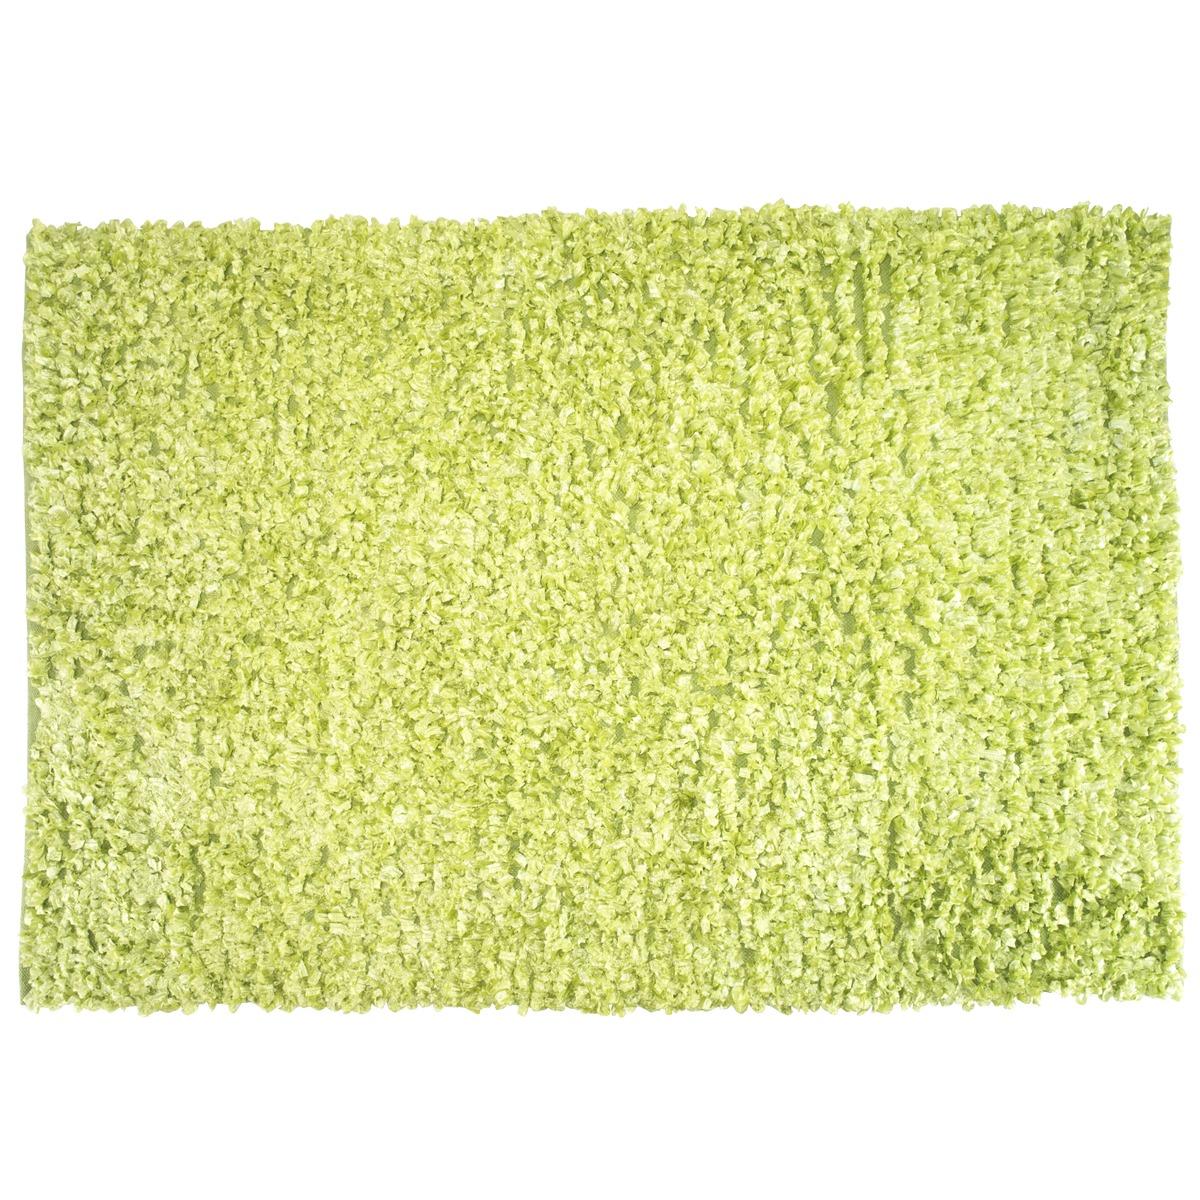 tapis shaggy 120 x 170 cm vert anis